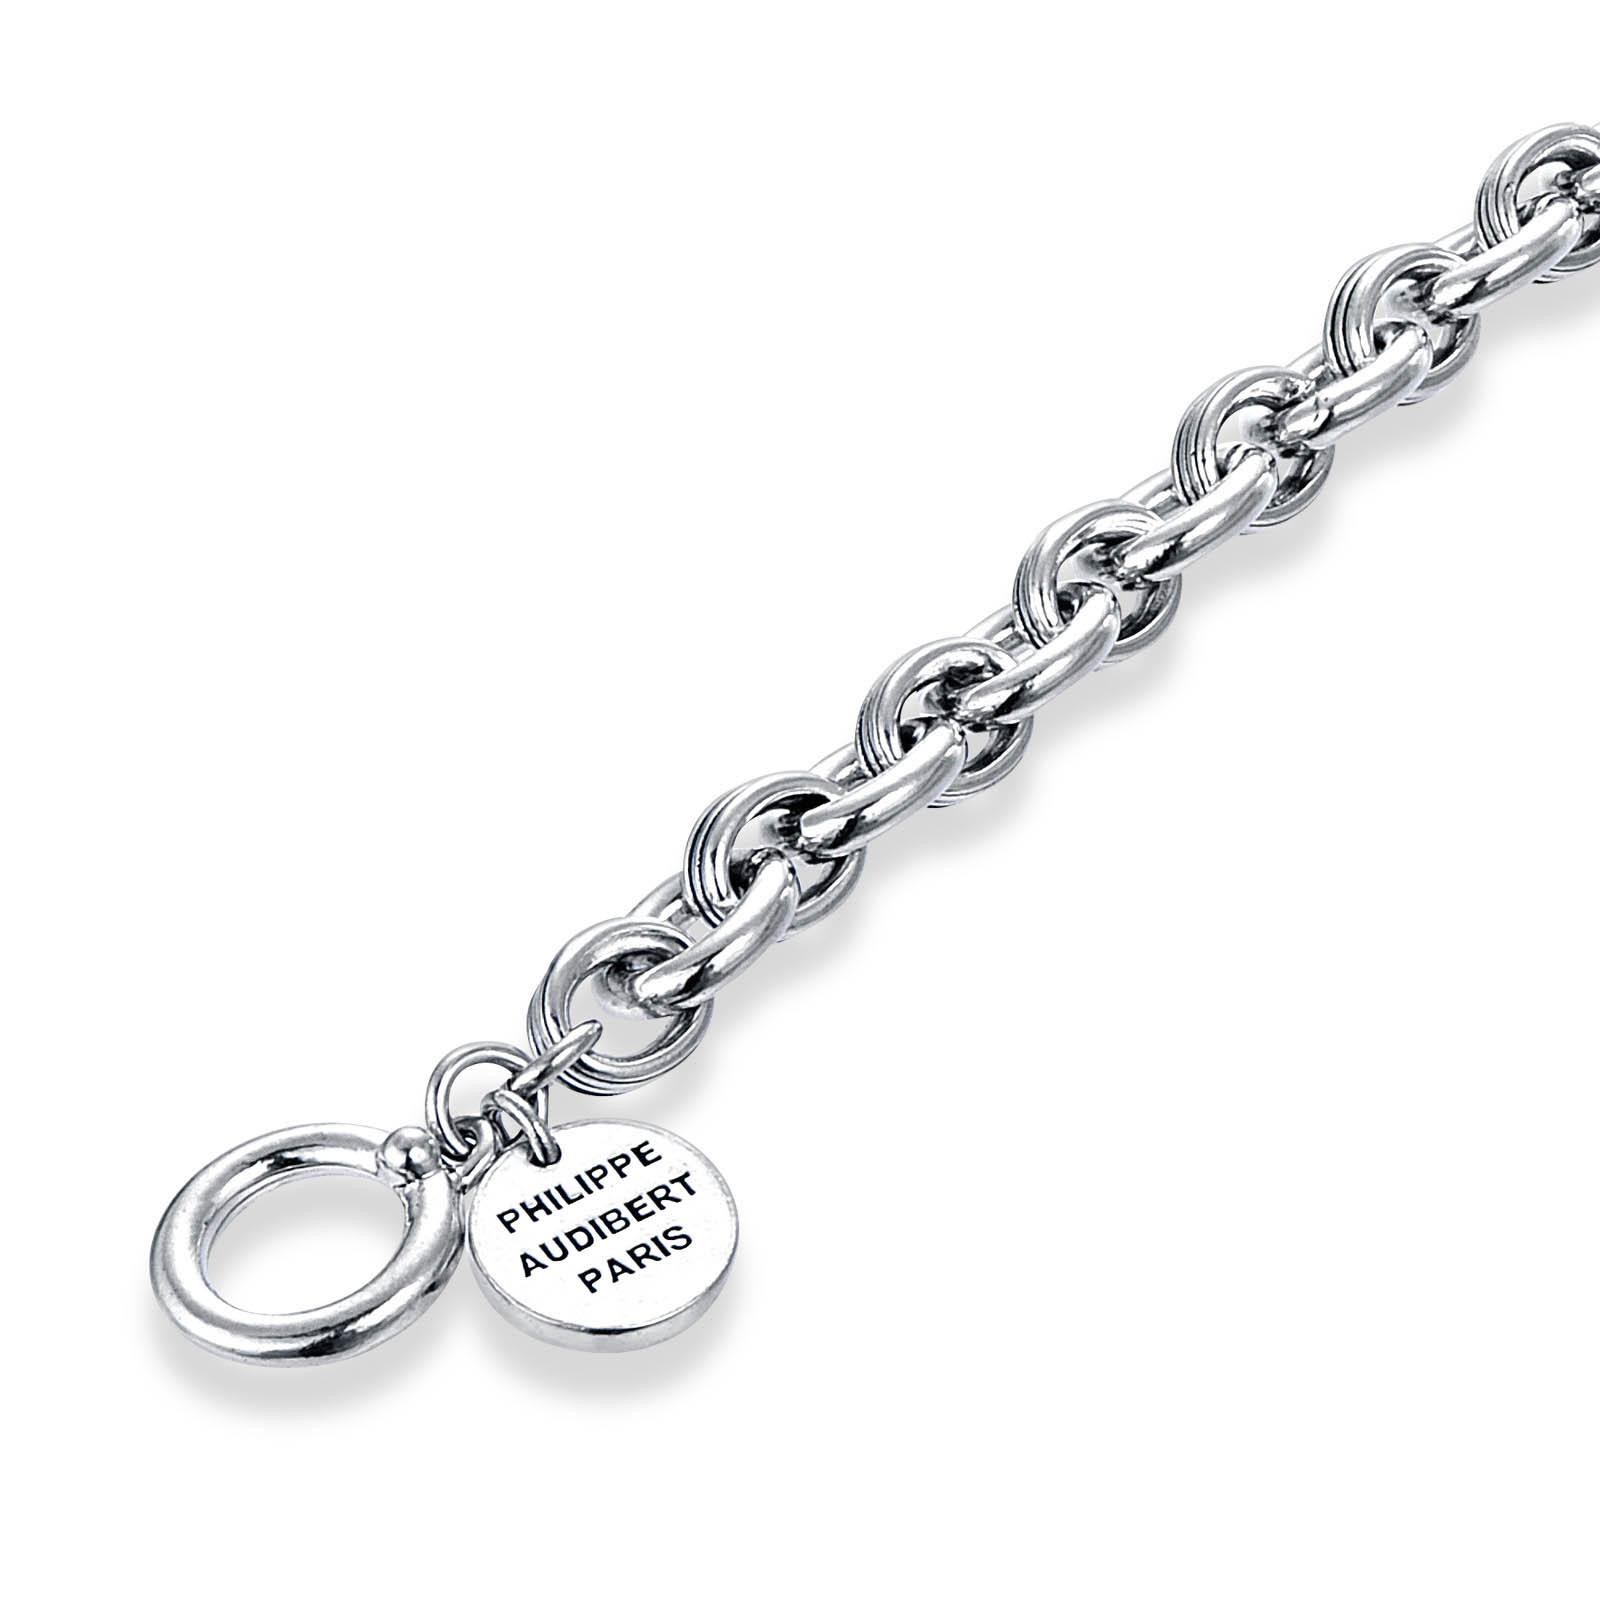 PHILIPPE AUDIBERT Chaine PSG Bracelet